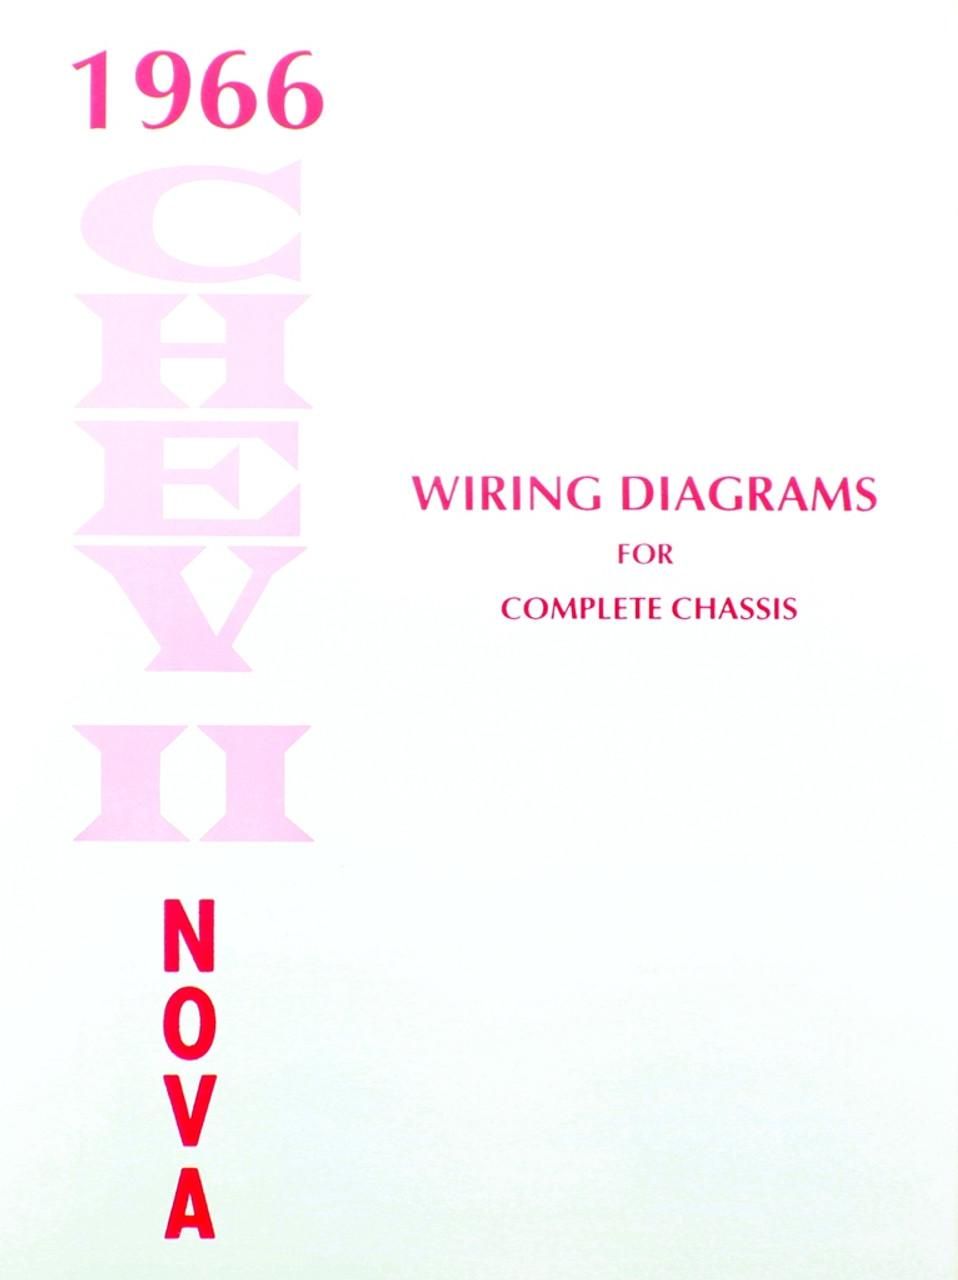 66 chevy nova electrical wiring diagram manual 1966 i 5 classic chevy rh i5chevy com